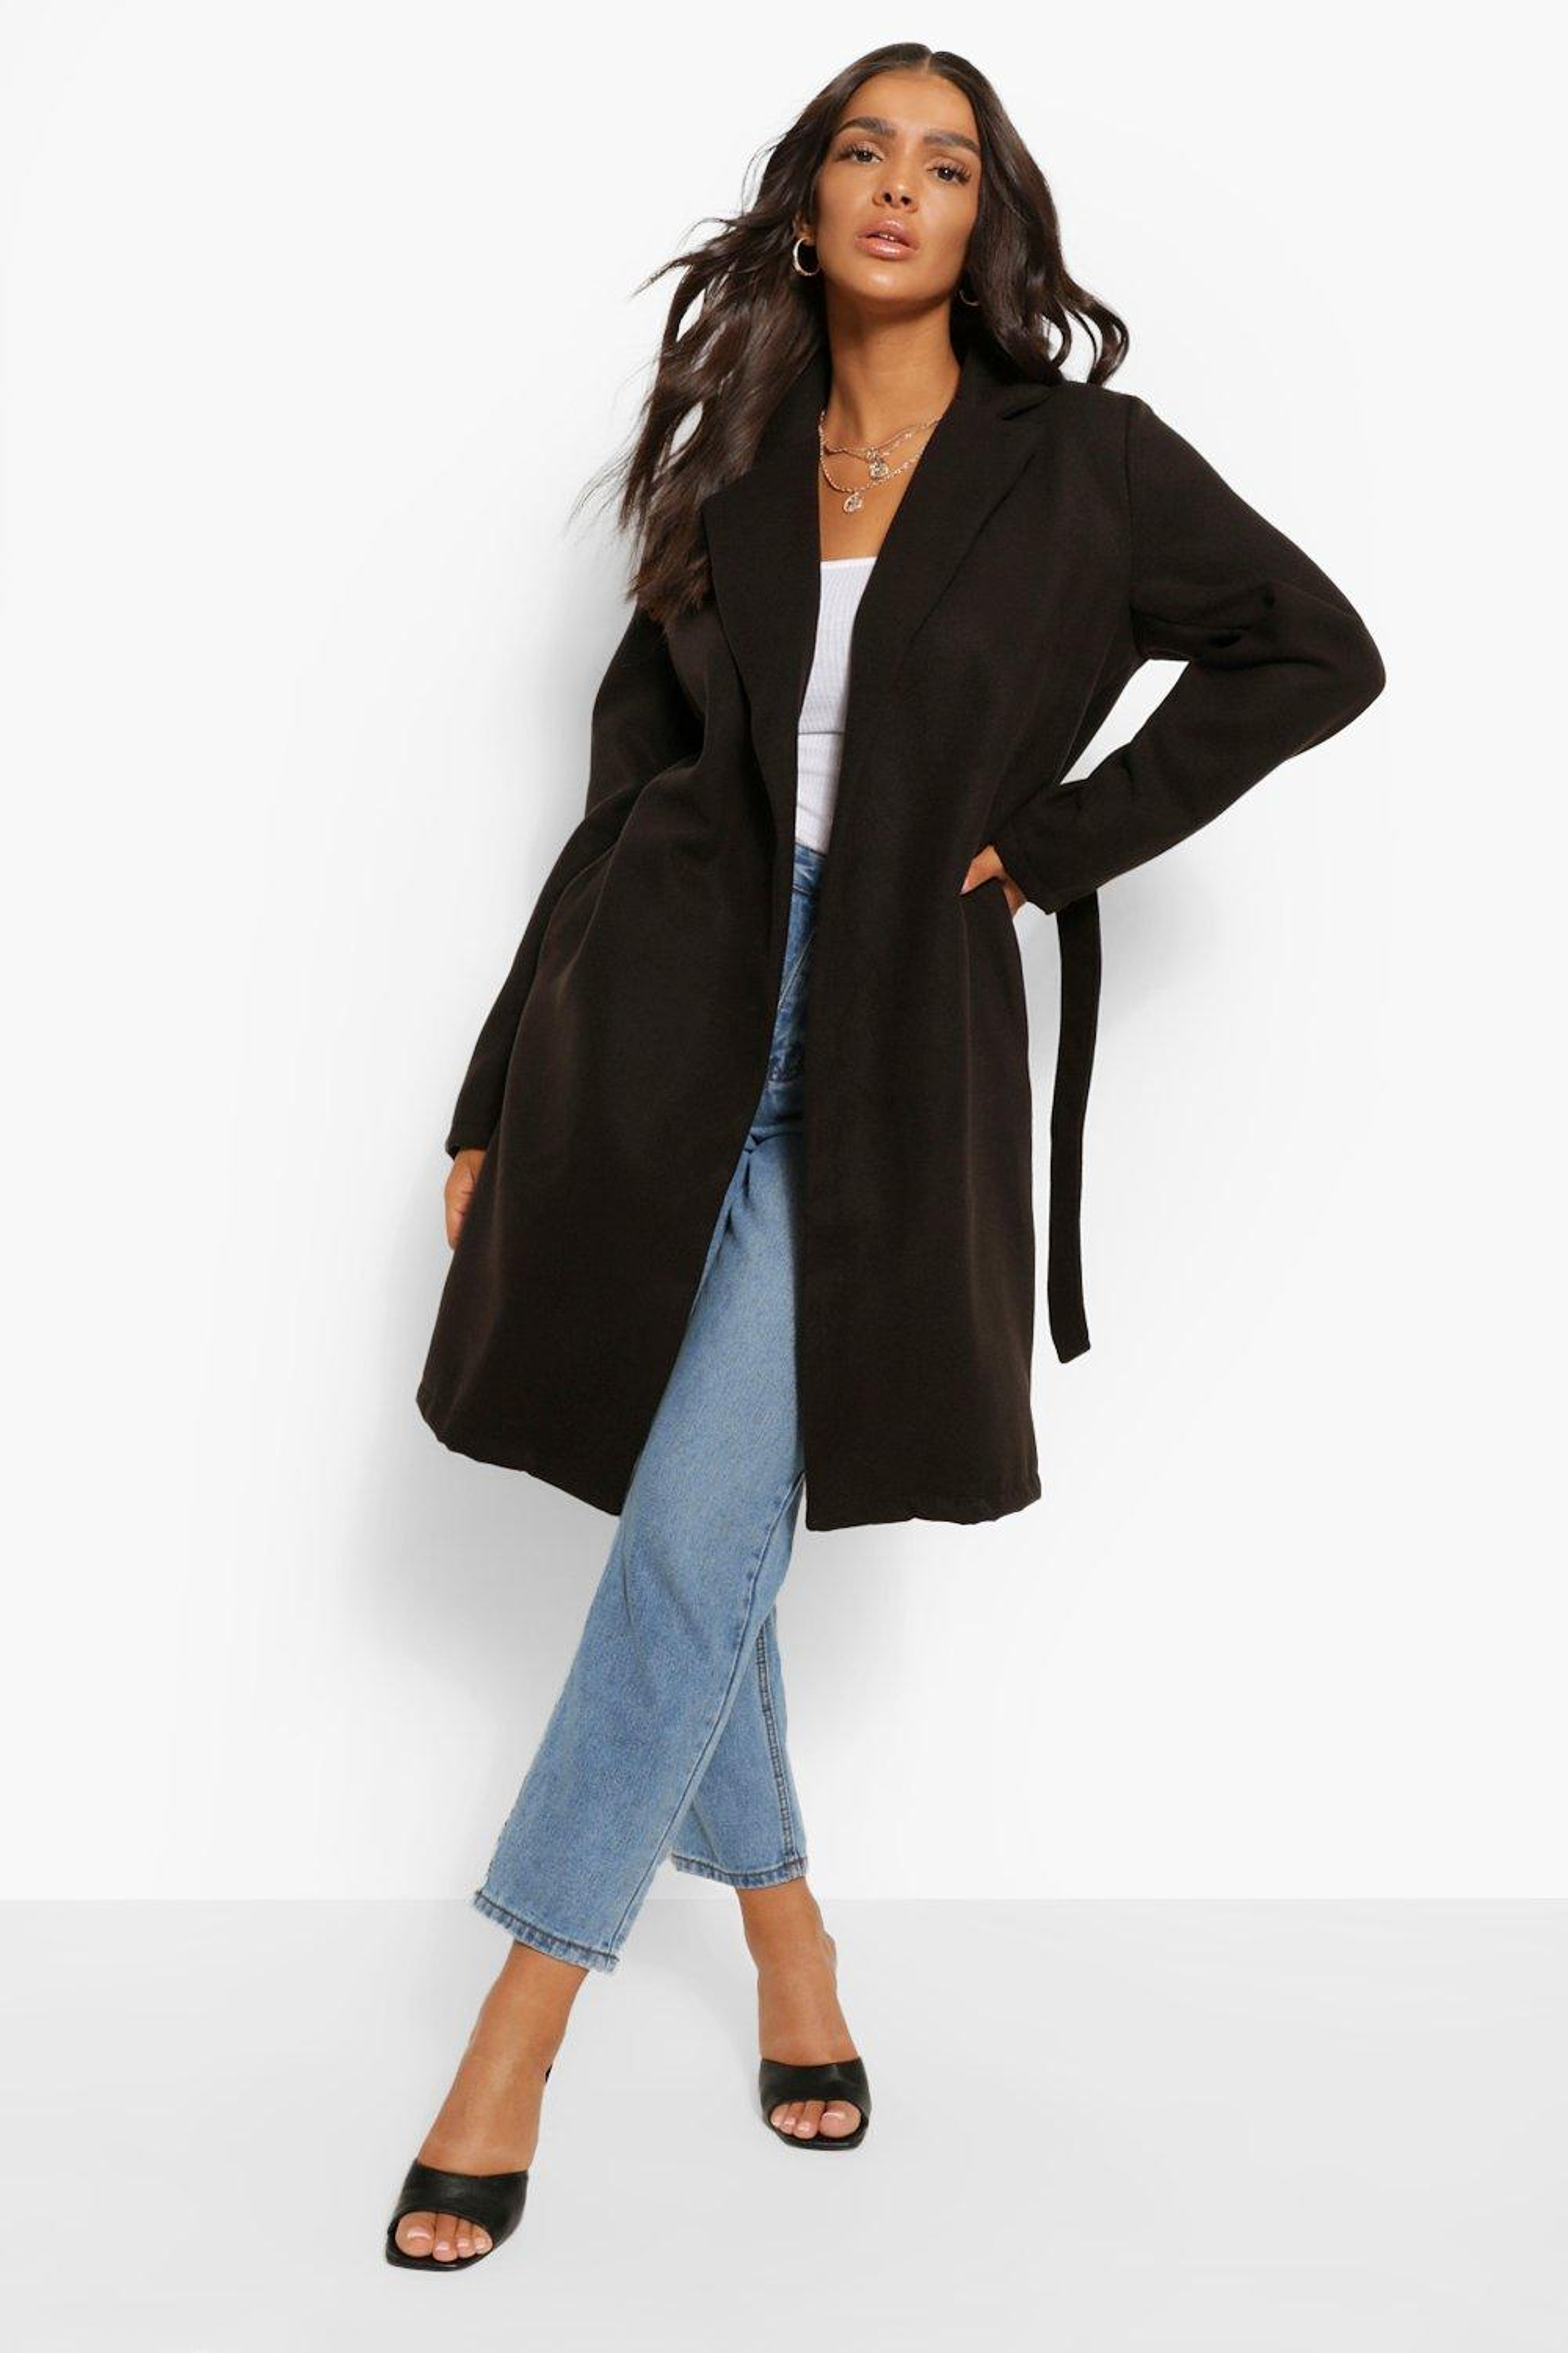 COATS & JACKETS Belted Wool Look Coat